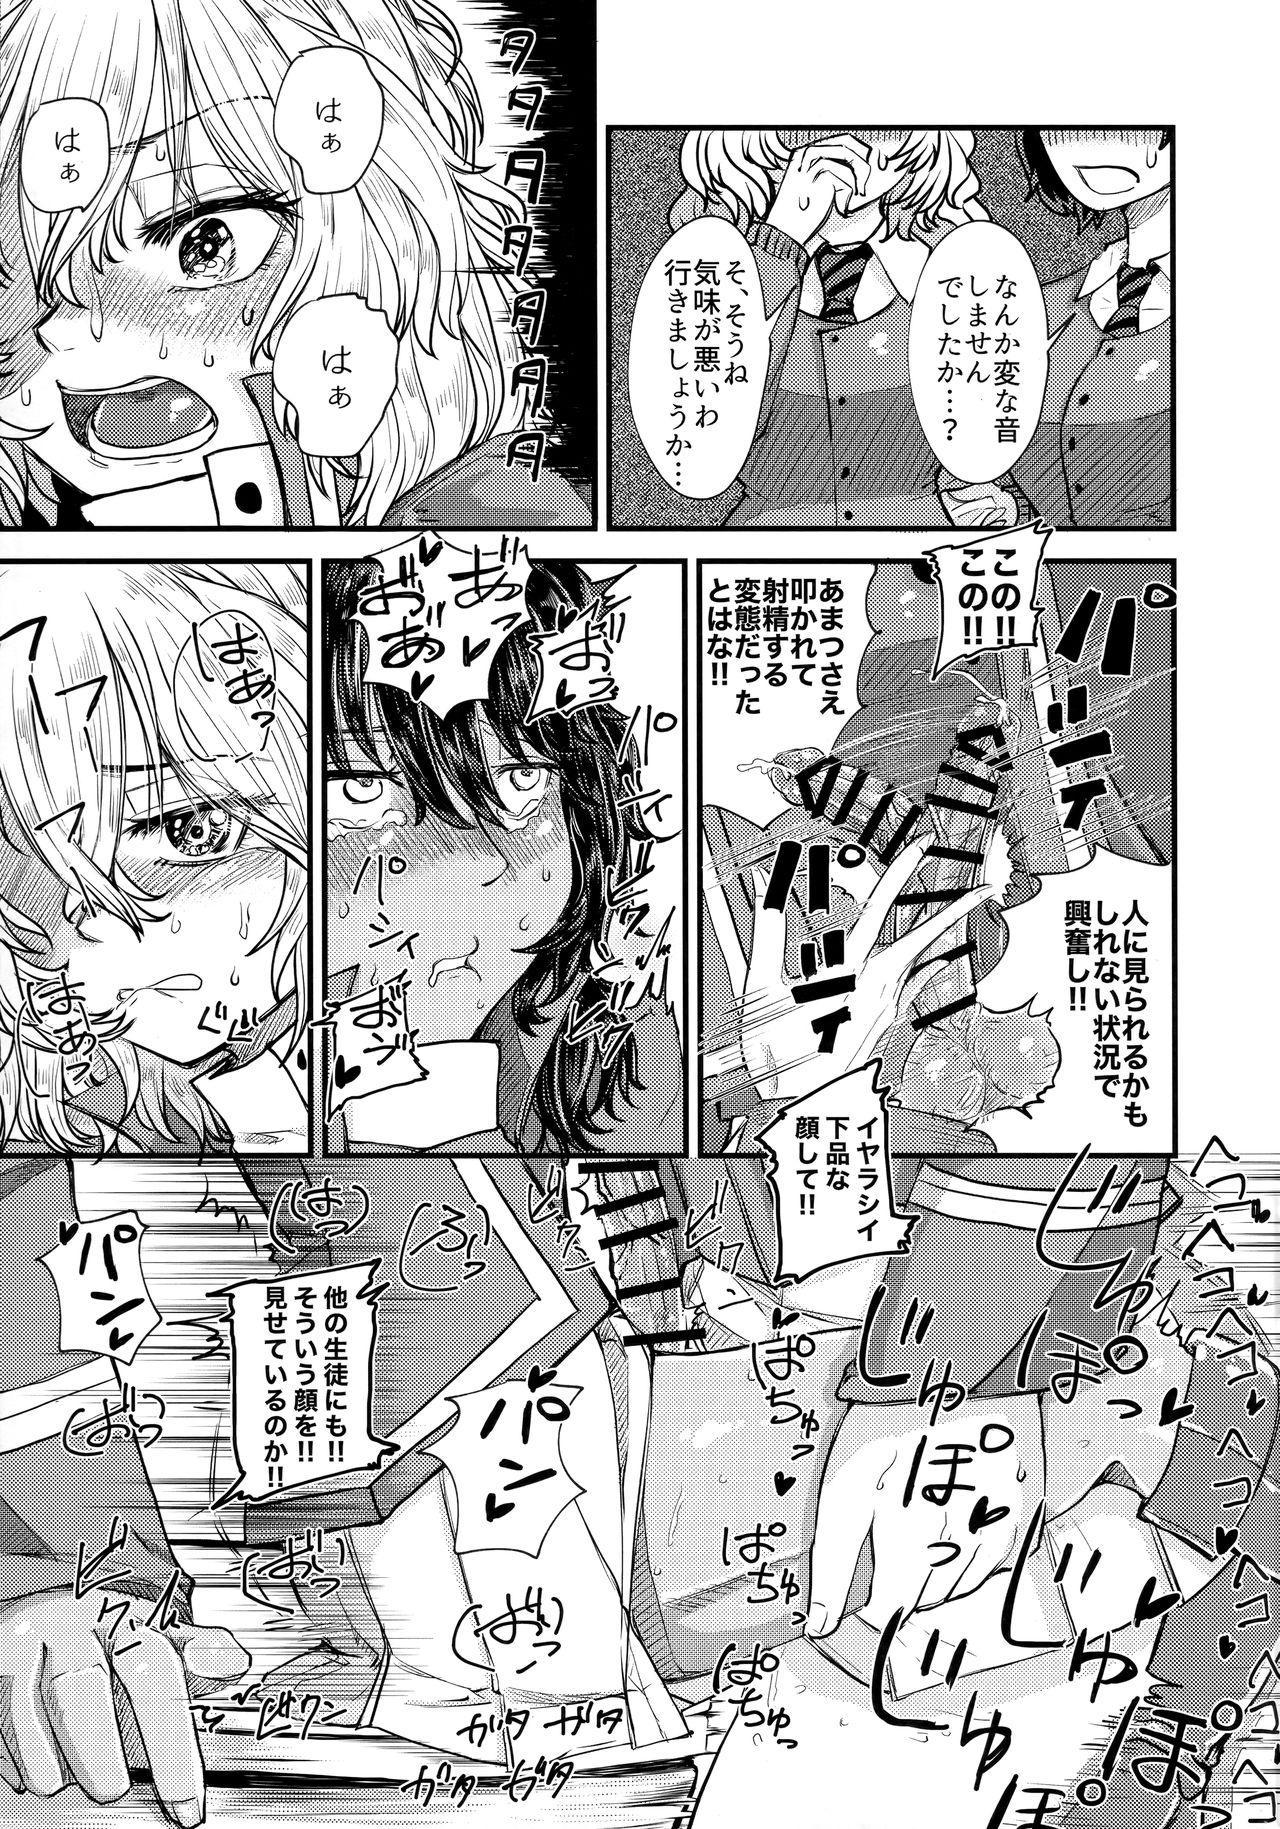 Kimi o Aishitai. 19